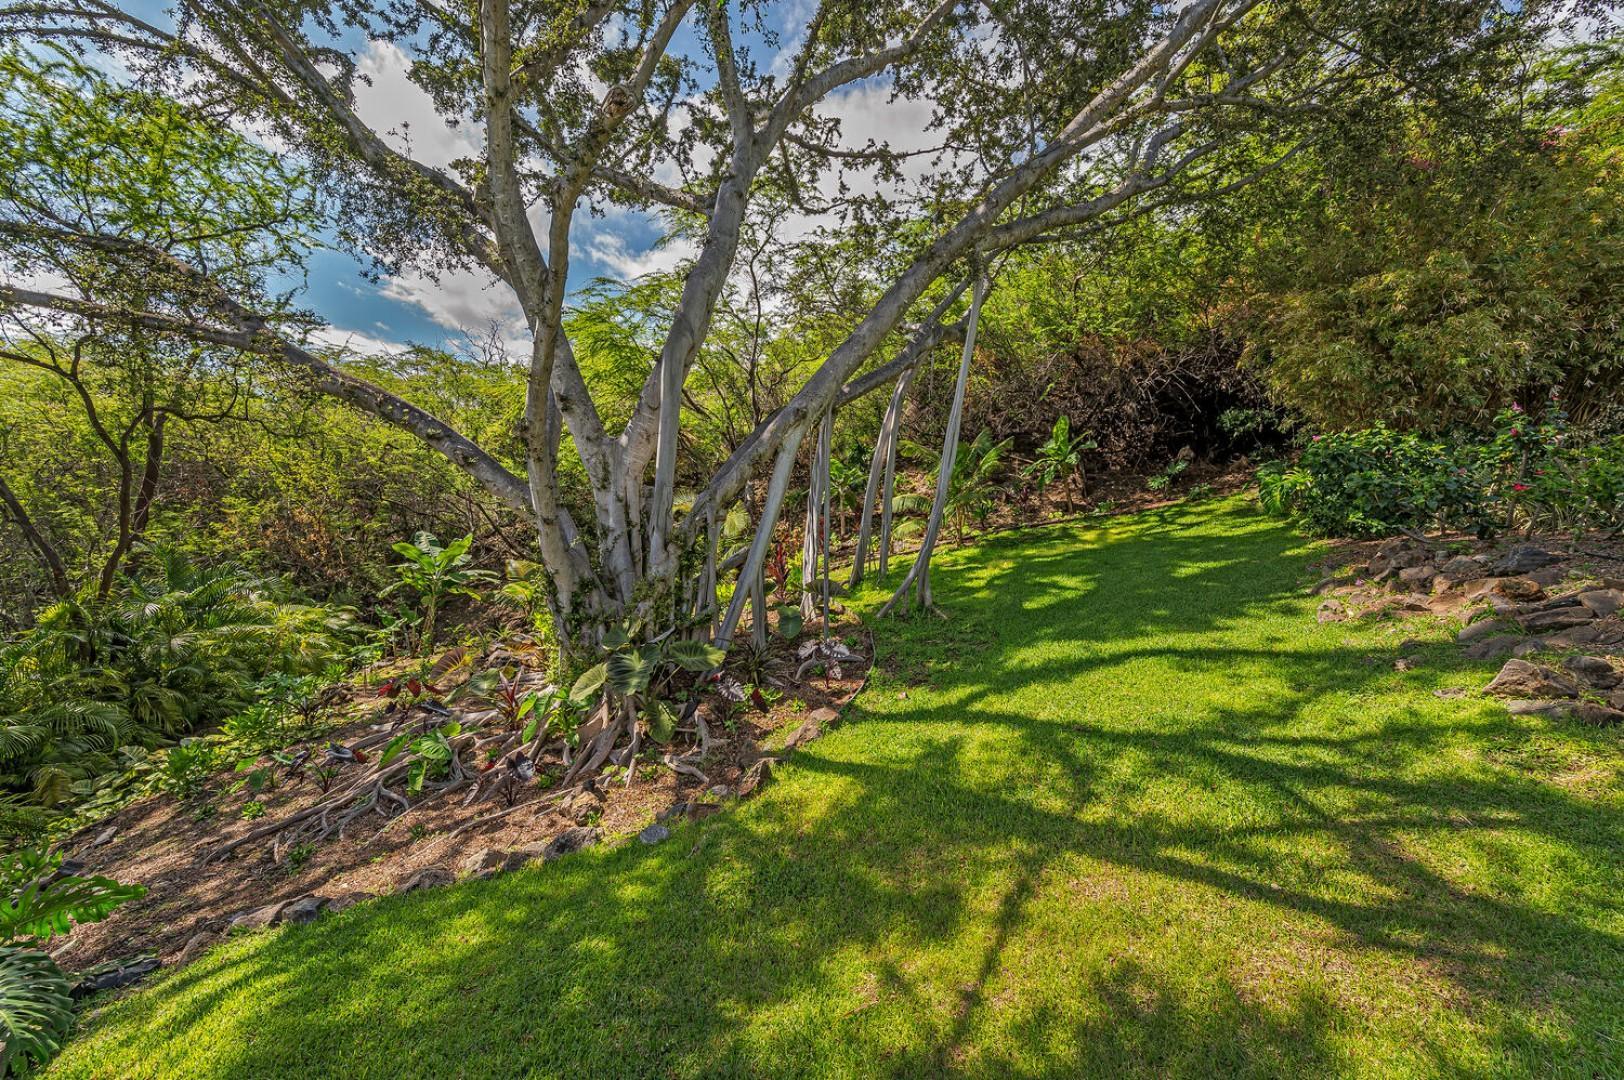 Beautiful banyan tree in backyard